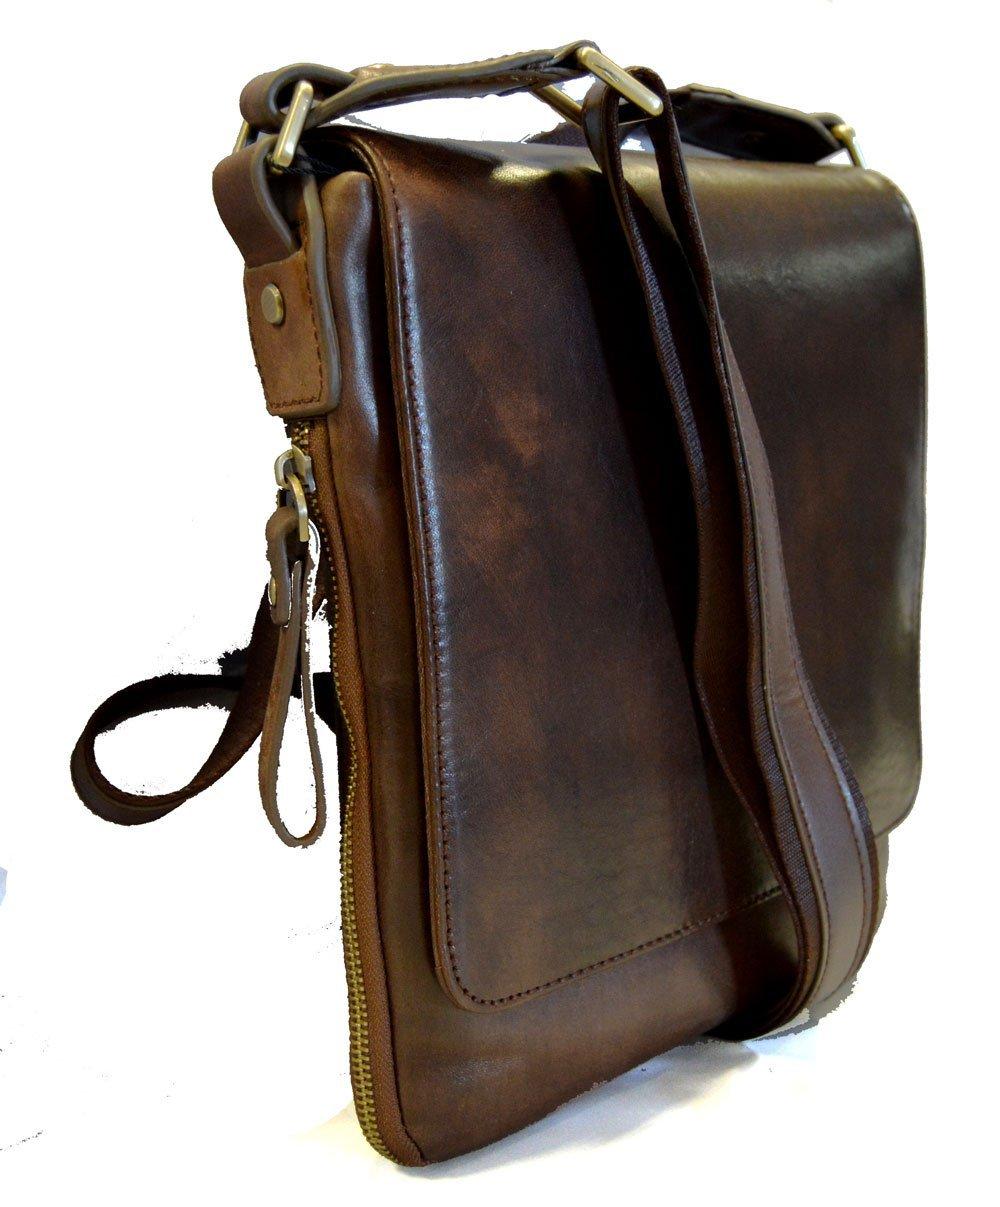 Amazon.com  Leather shoulder bag mens women sling bag messenger leather  satchel crossbody leather postman bag hobo bag dark brown  Handmade 06e04f9545f0b